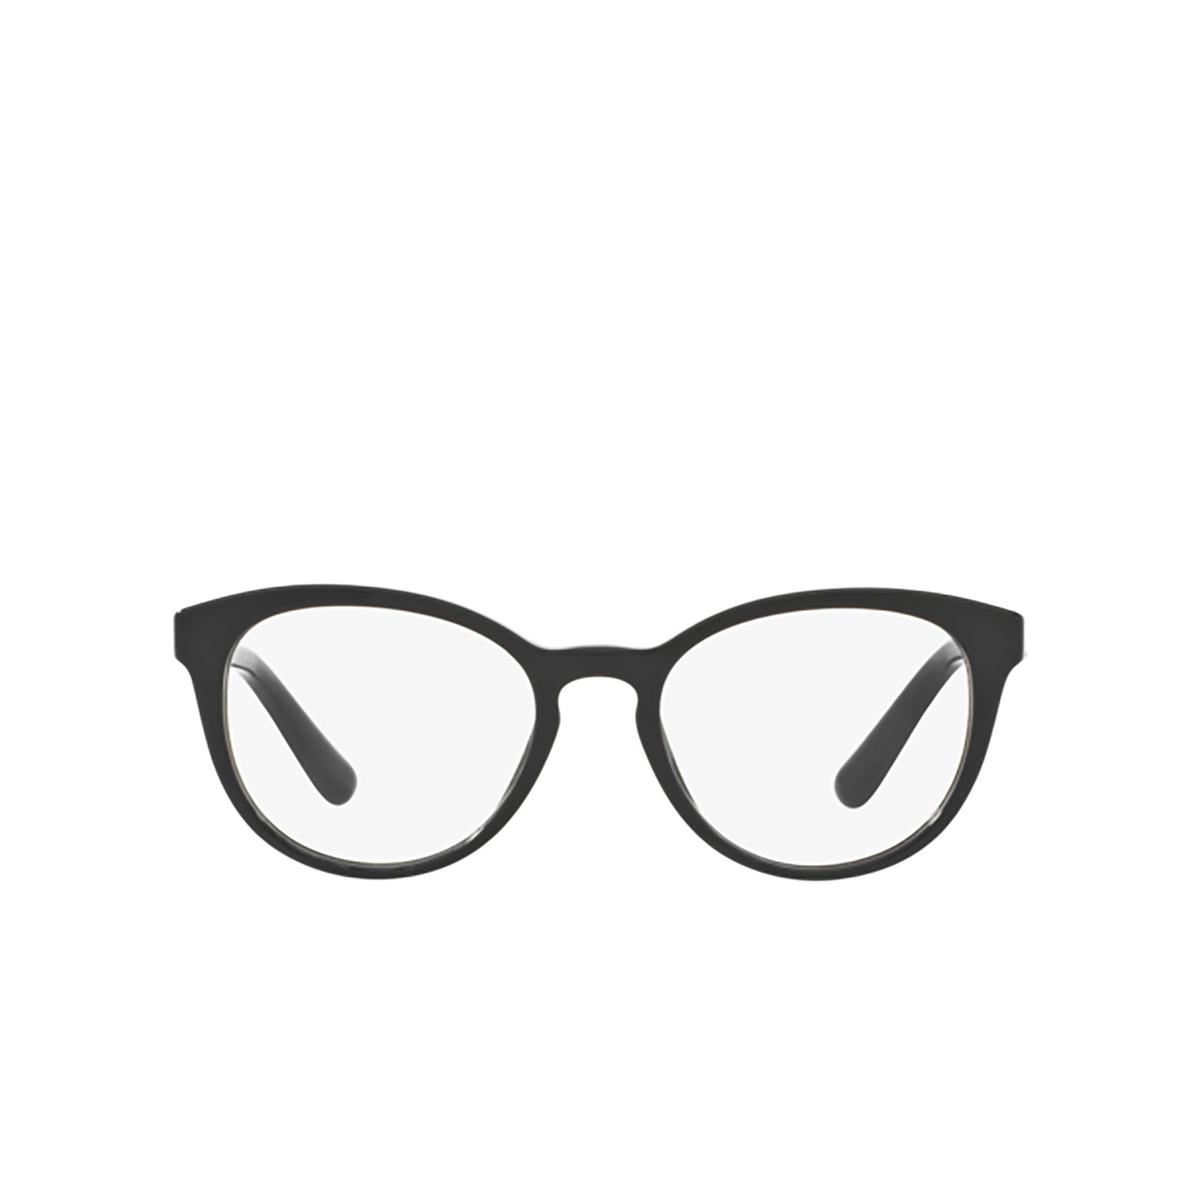 Dolce & Gabbana® Cat-eye Eyeglasses: DG3268 color Black 501.